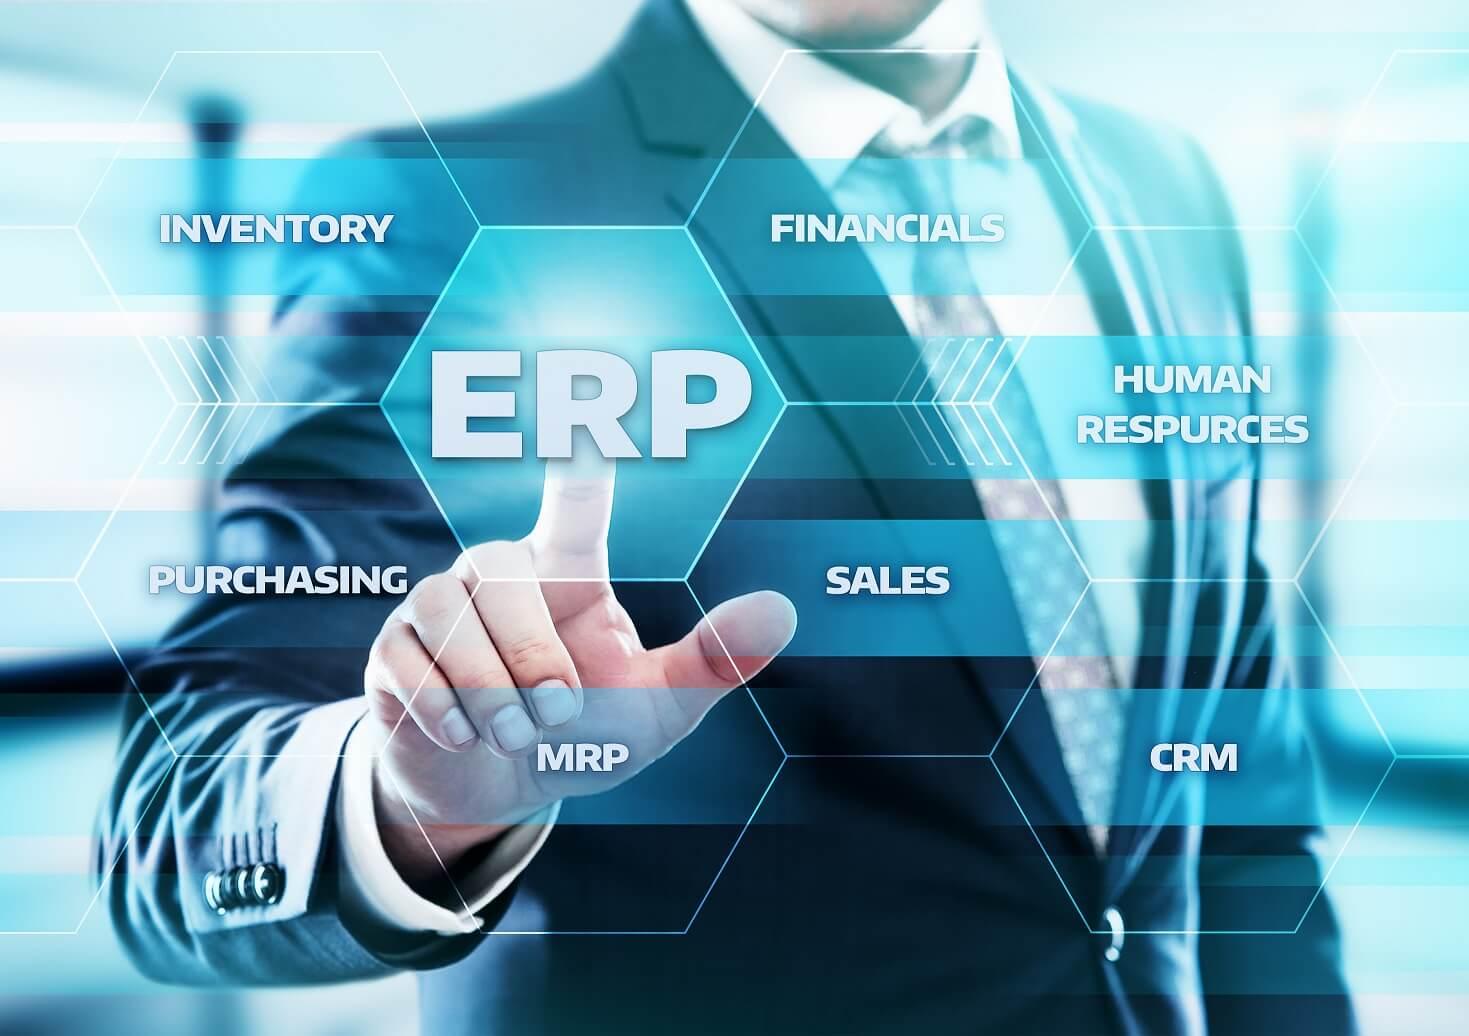 Enterprise Resource Planning ERP software image